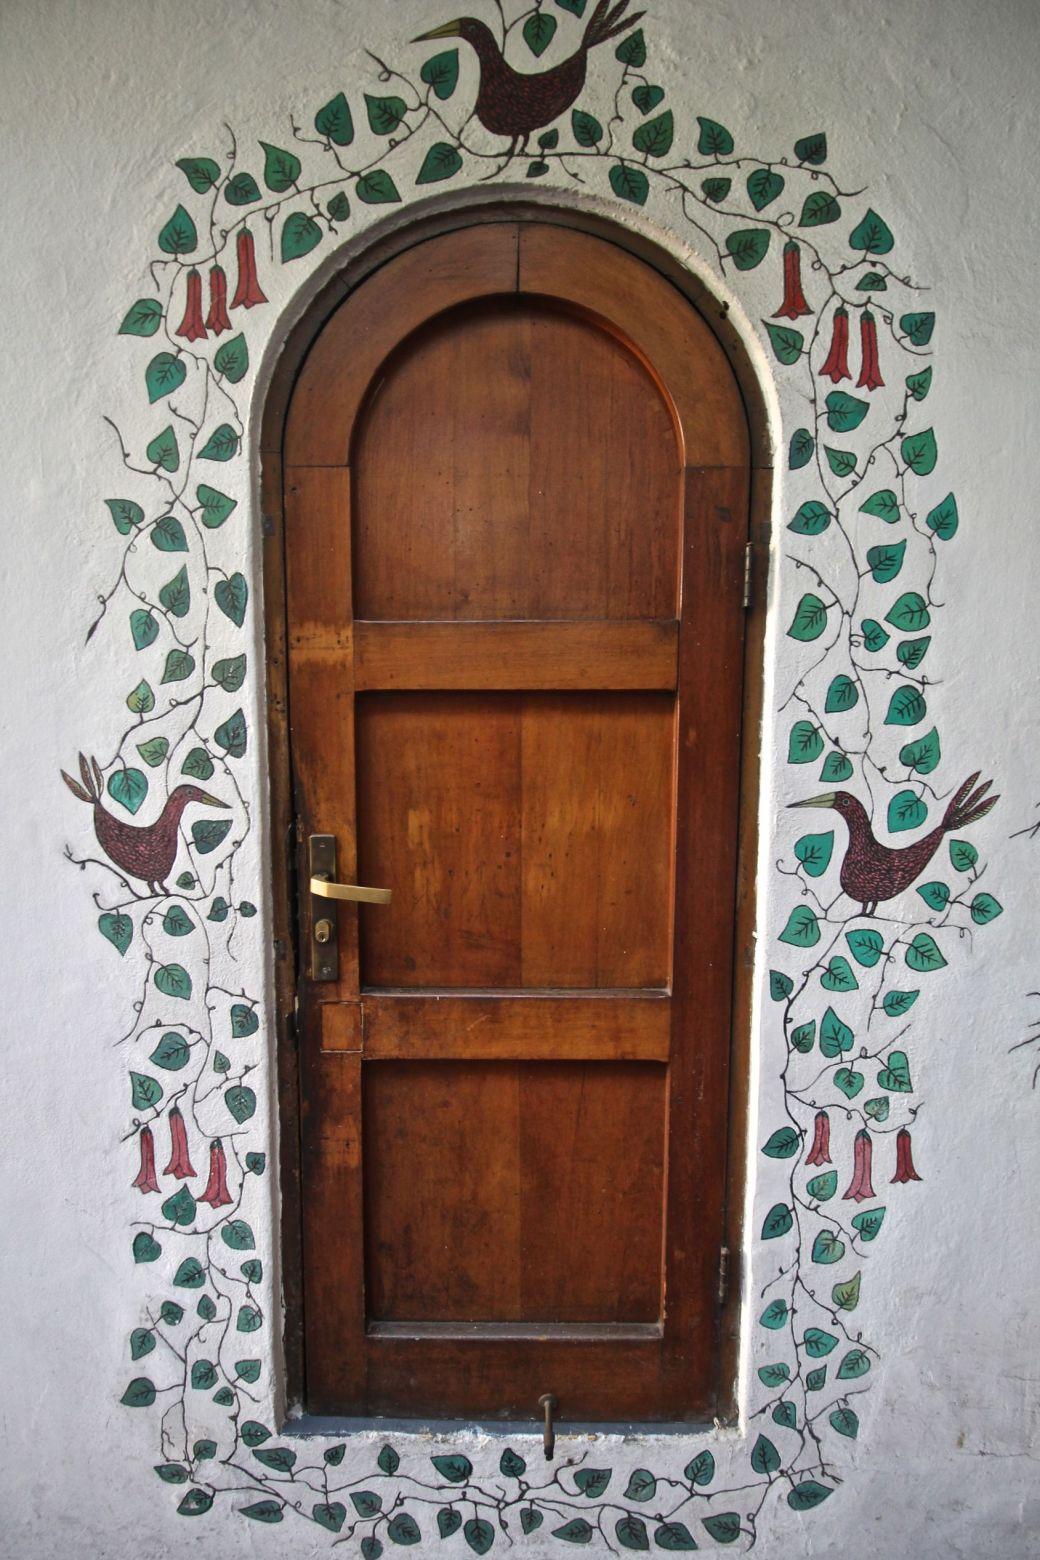 chile santiago pablo neruda house door mural 1